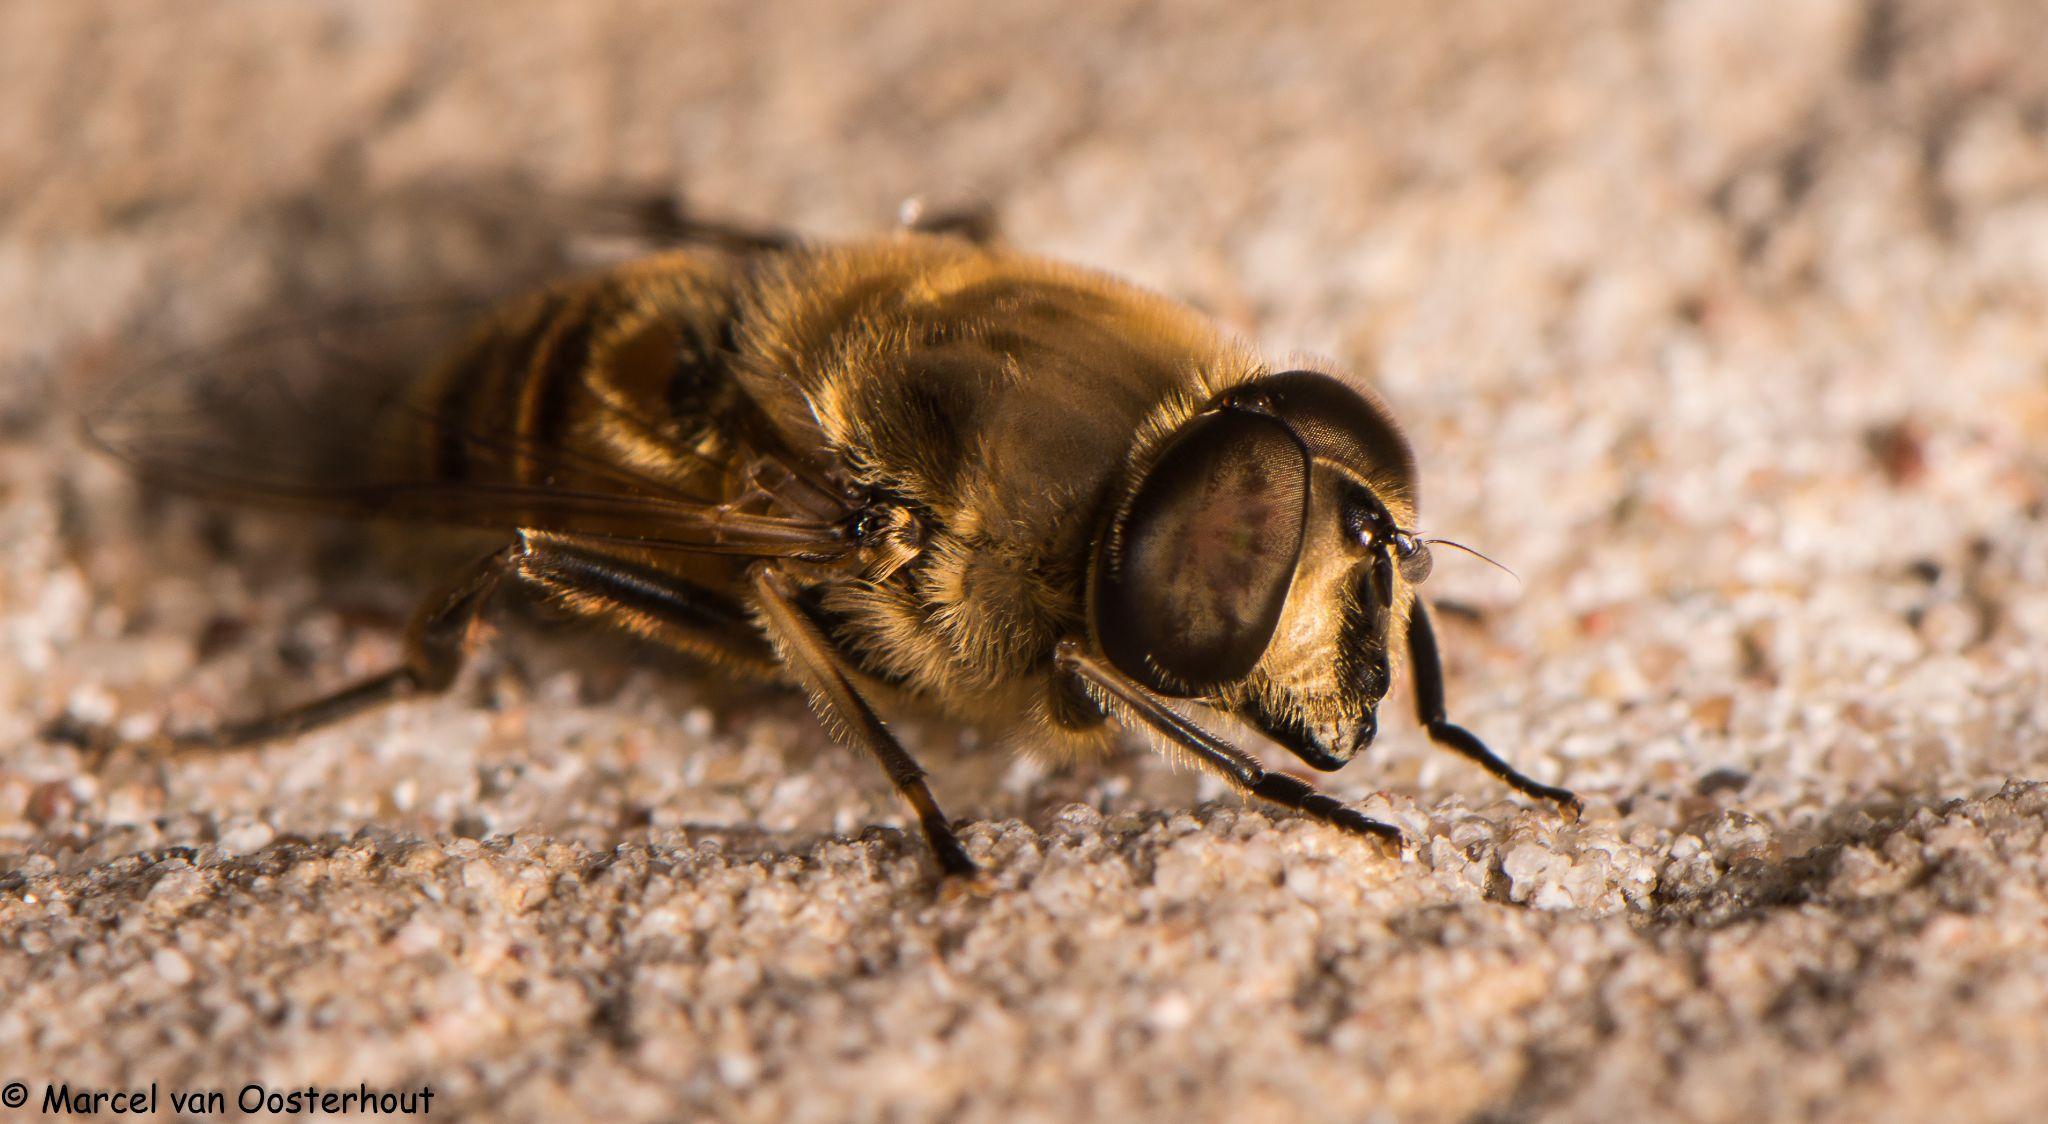 hoverfly by Marcel van Oosterhout